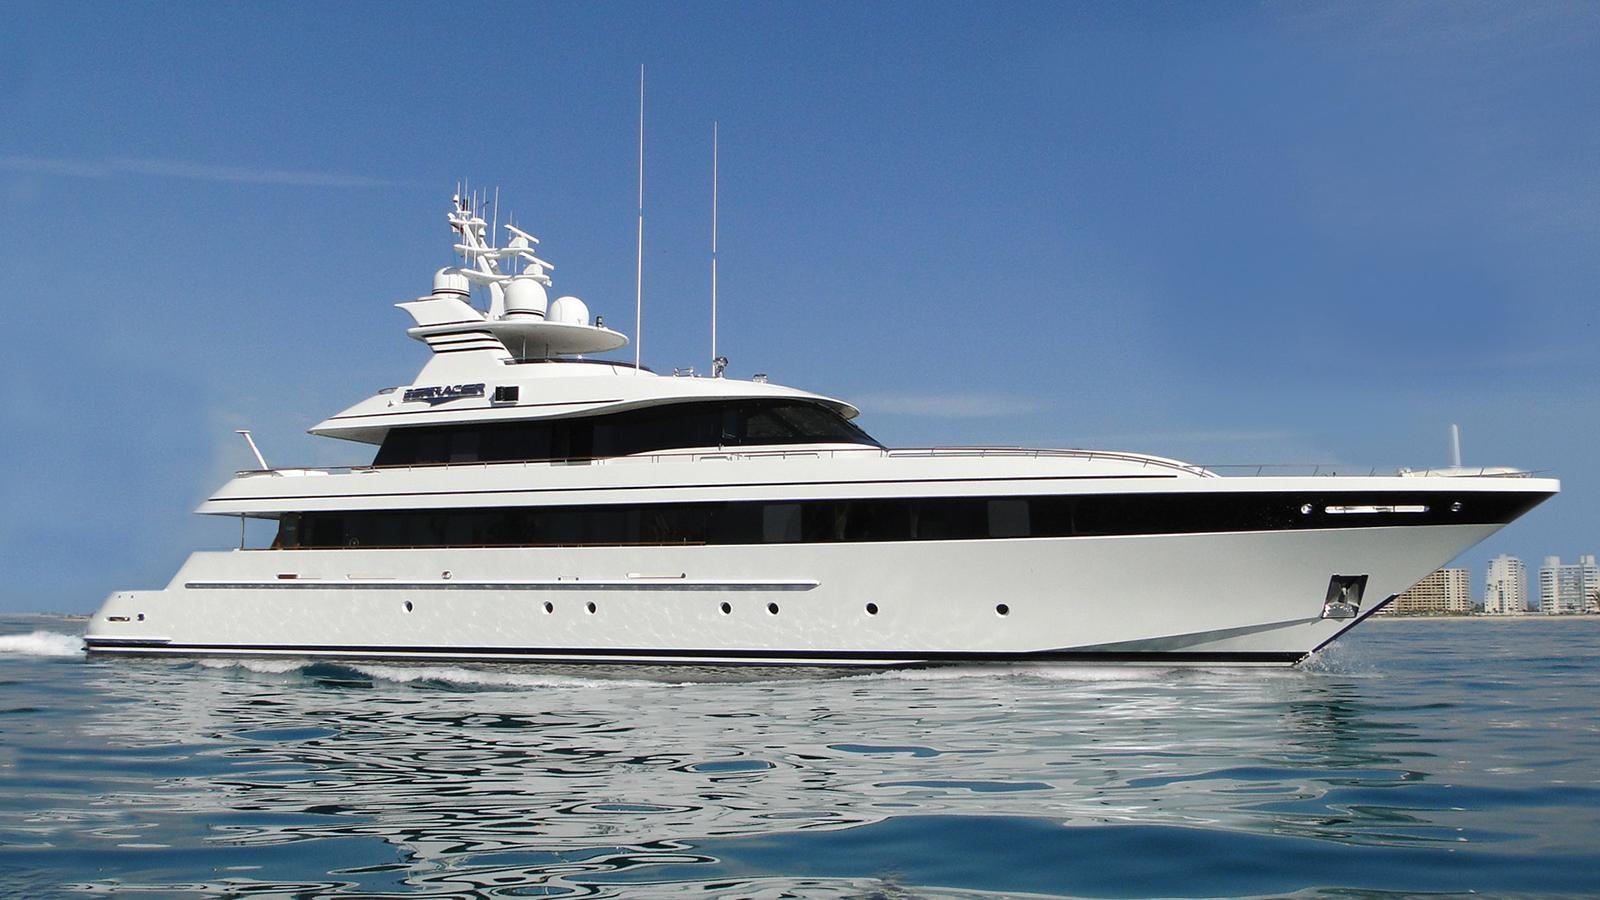 Multi-Award-Wining High-Speed Feadship Motor Yacht - 153 FEADSHIP For Sale